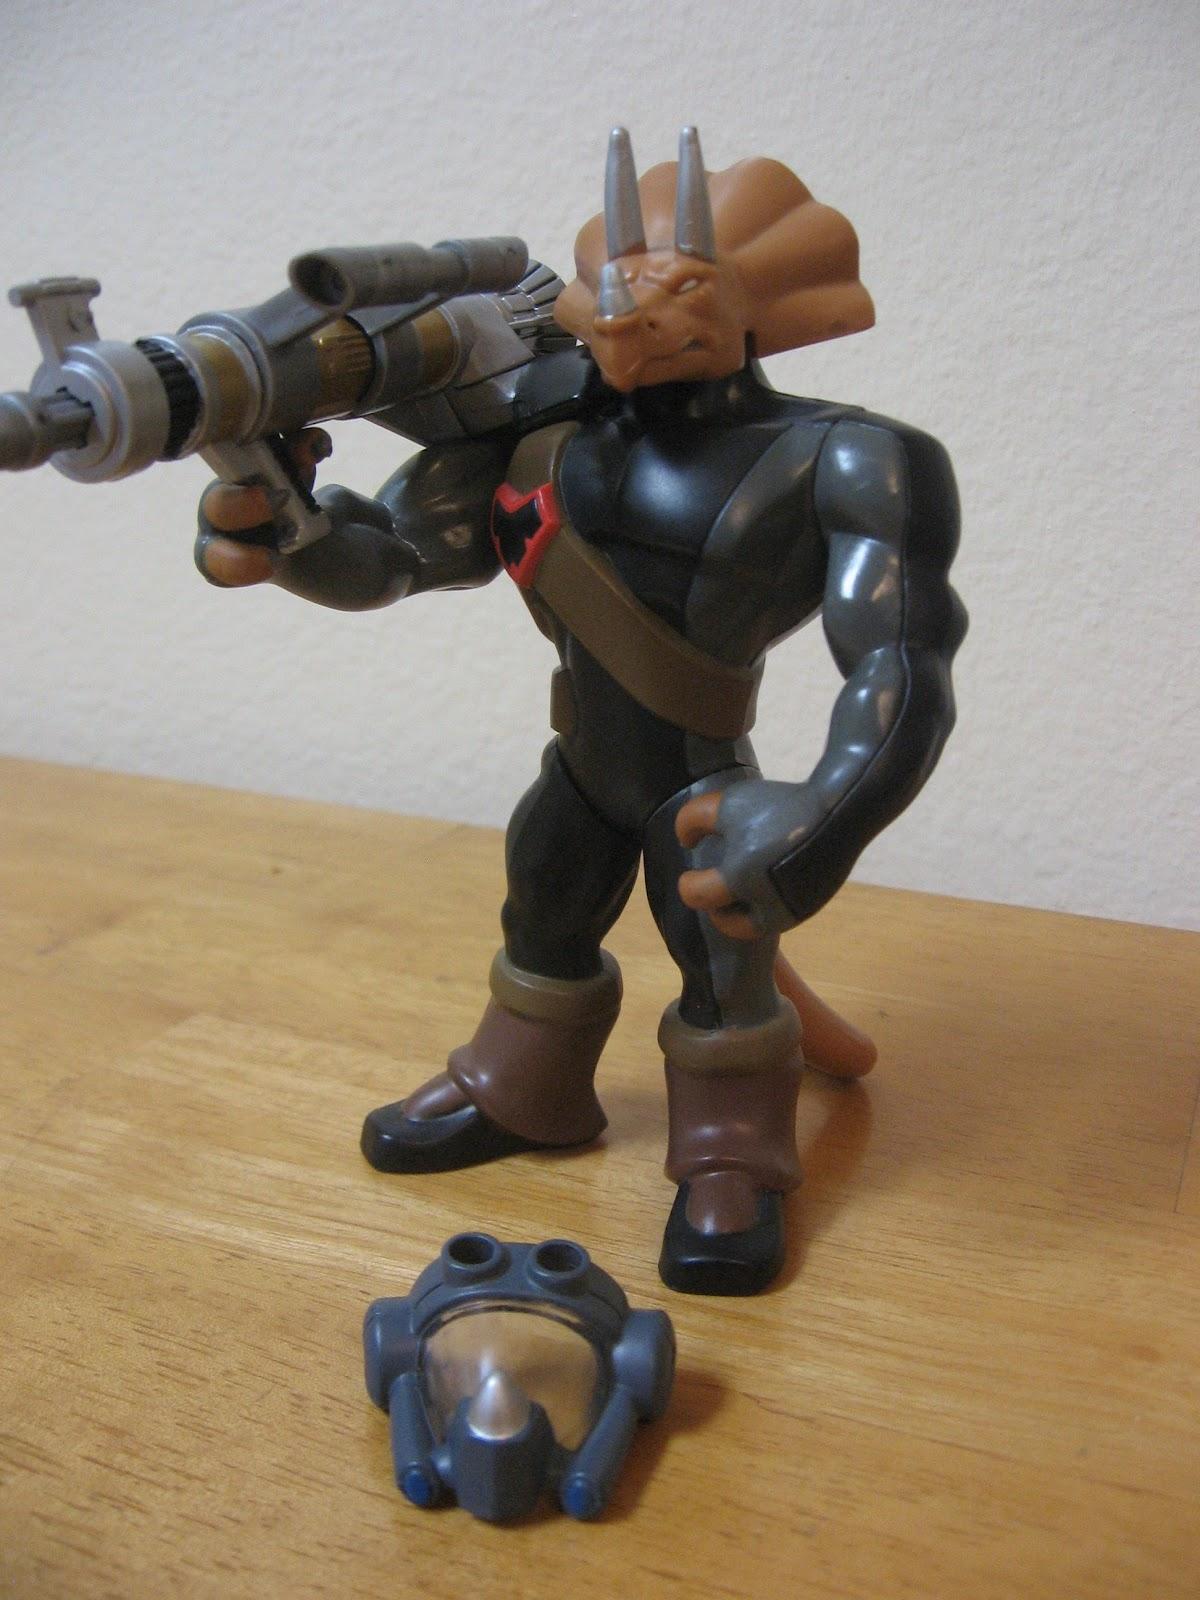 Teenage Mutant Ninja Turtles 2003 Toys : Why did i buy that toy triceraton warrior